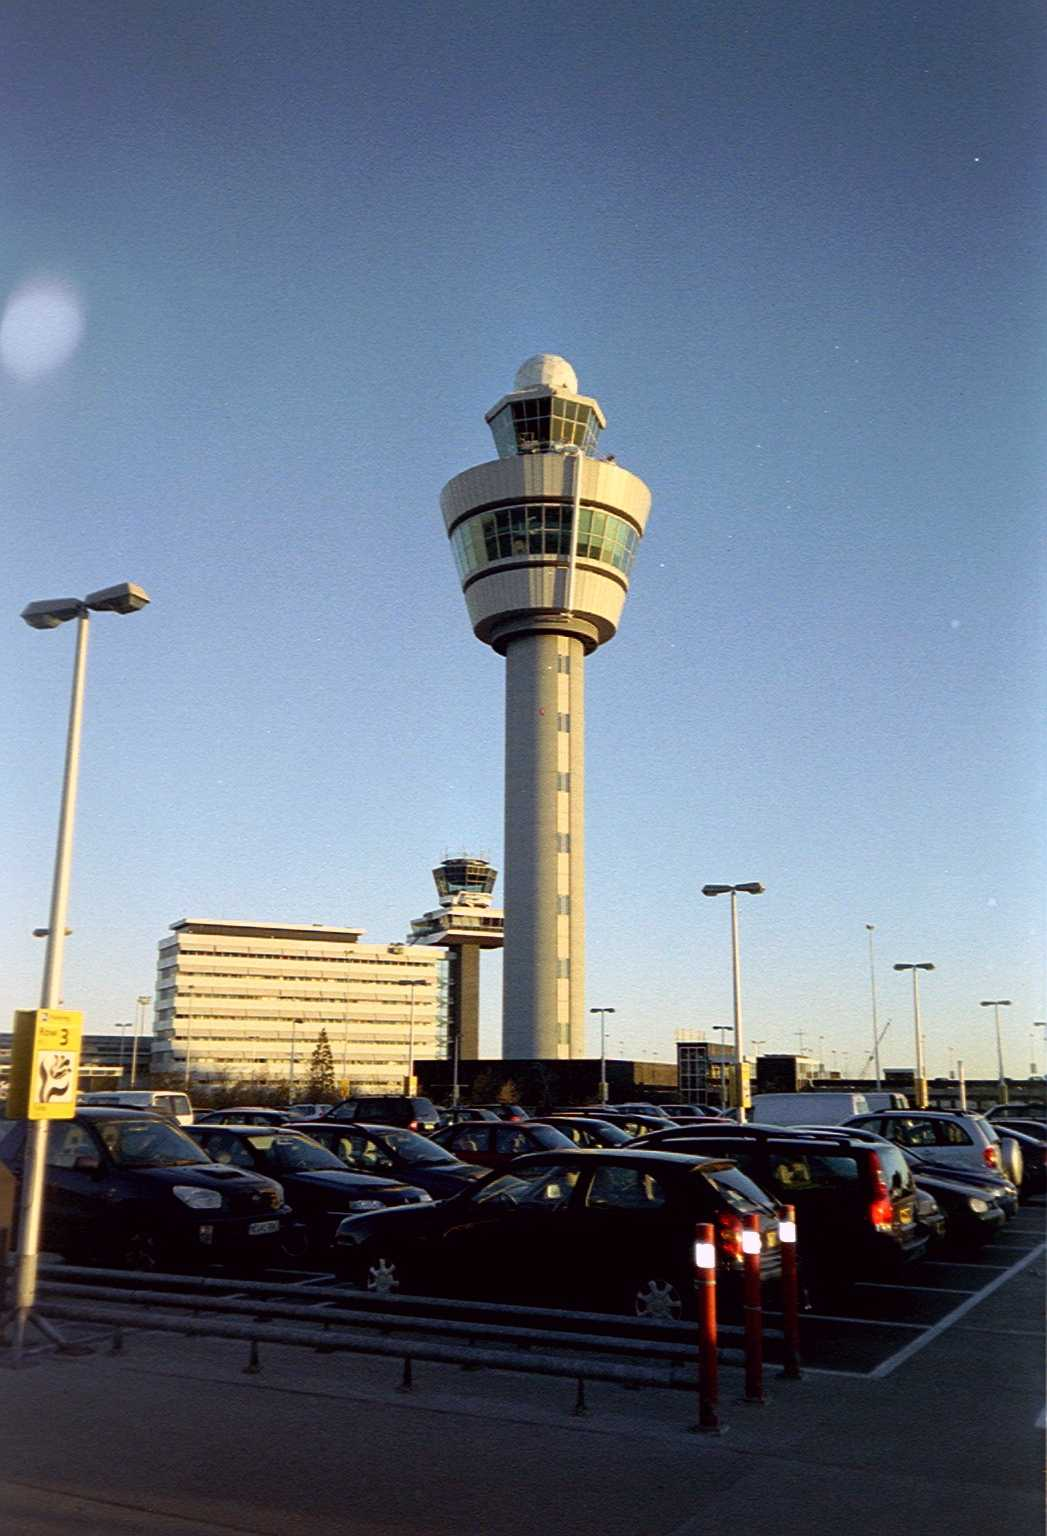 Torre de control de Amsterdam